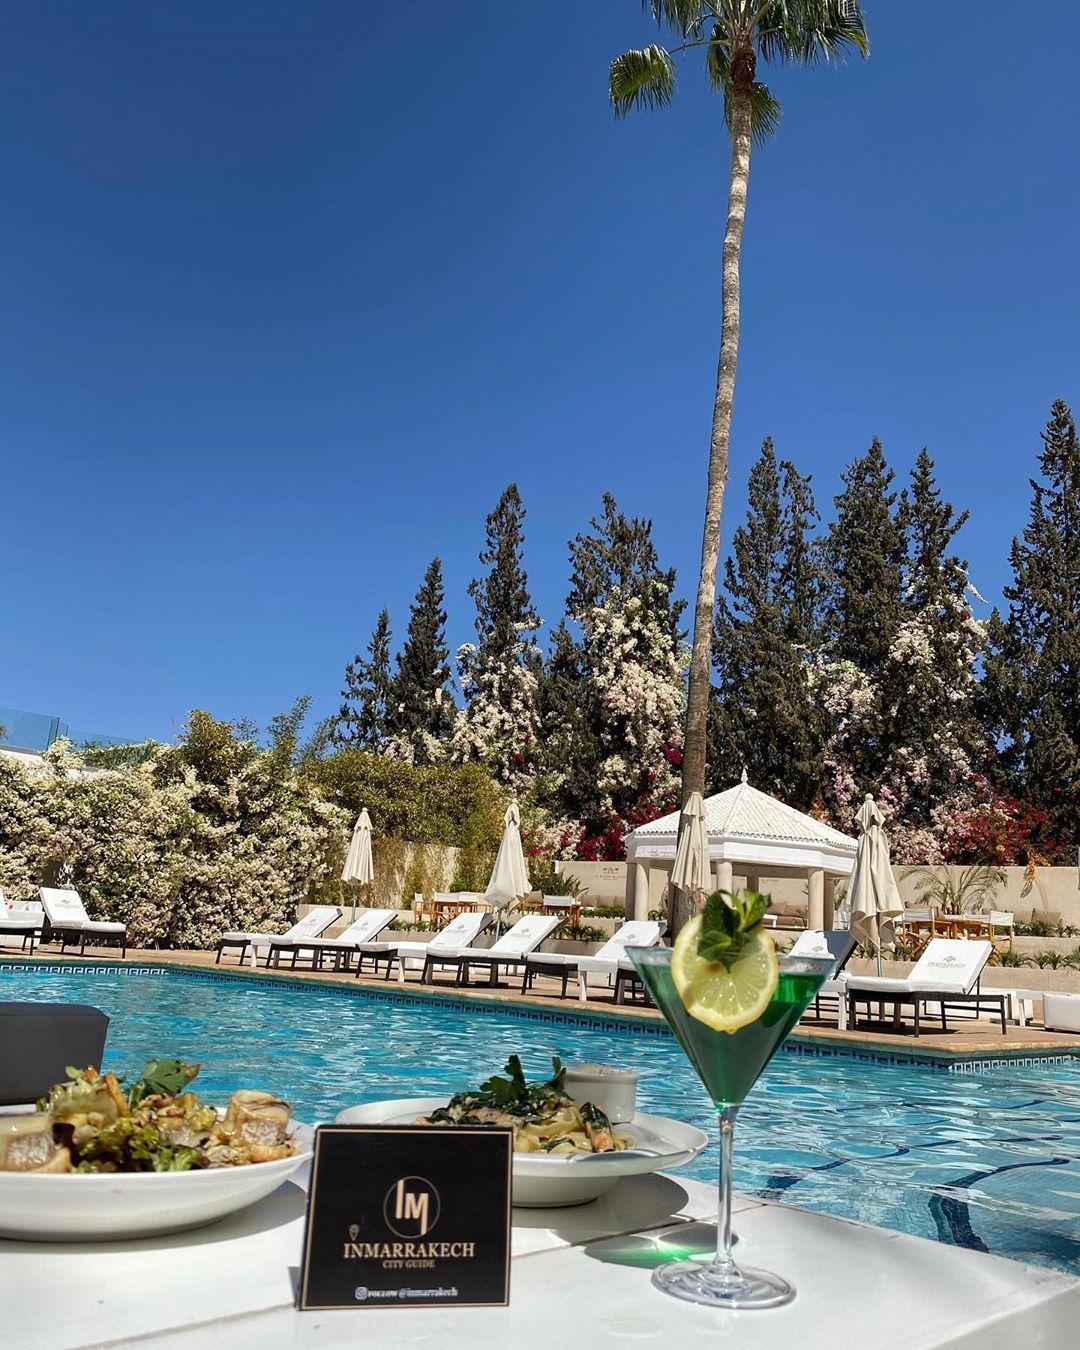 piscine ambiance tropicale #ambiance #piscine | ambiance piscine + ambiance piscine hors sol + piscine ambiance tropicale + ambiance bord de piscine + piscine ambiance zen